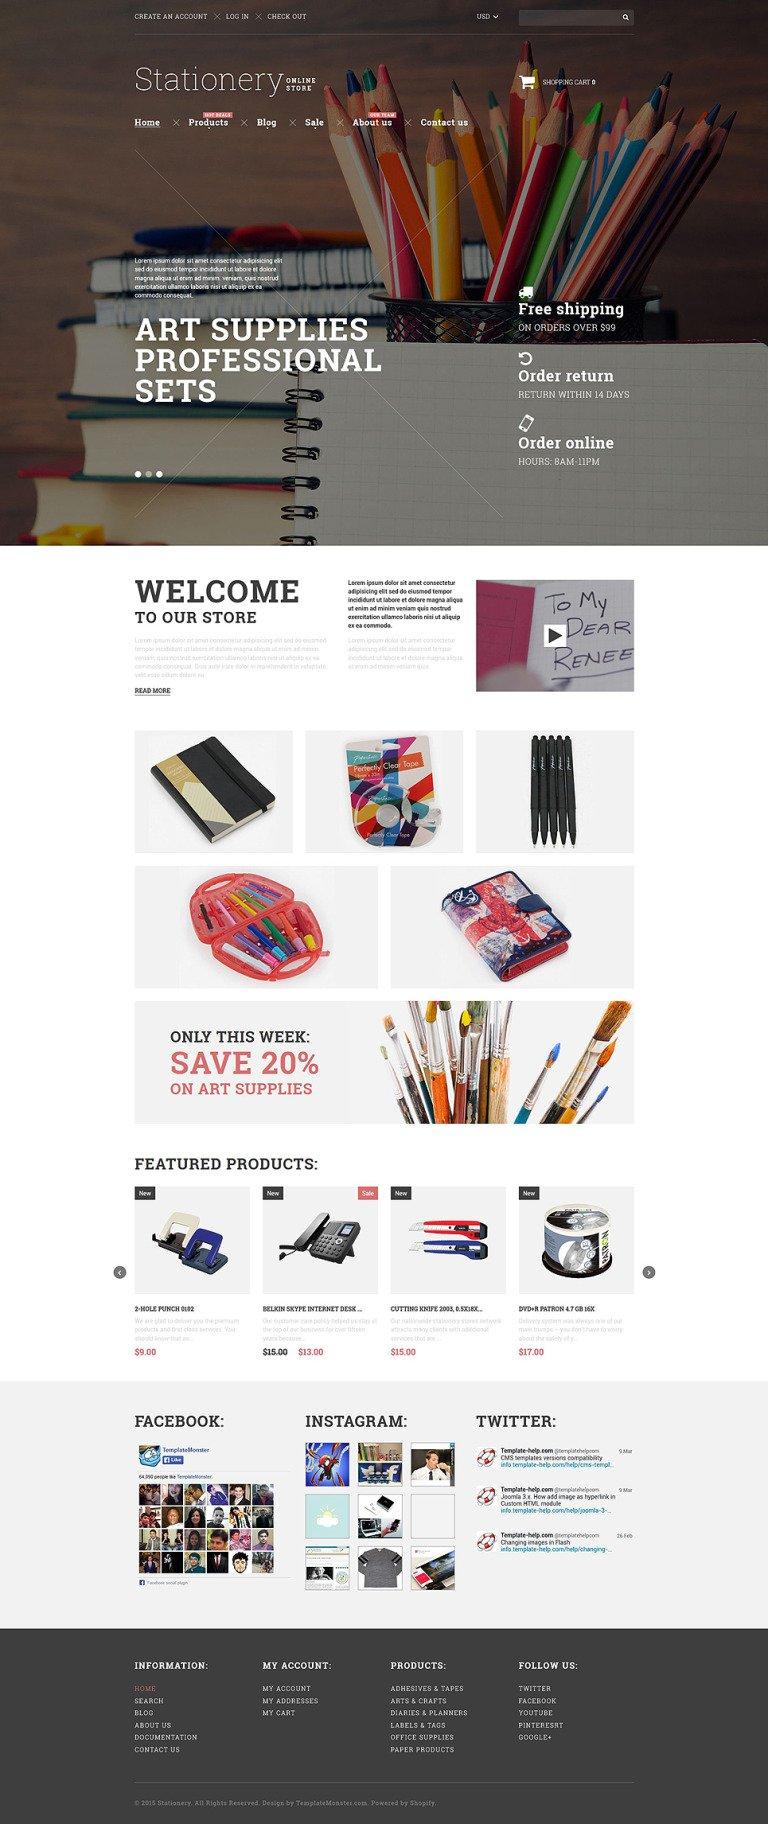 Stationery Goods Shopify Theme New Screenshots BIG